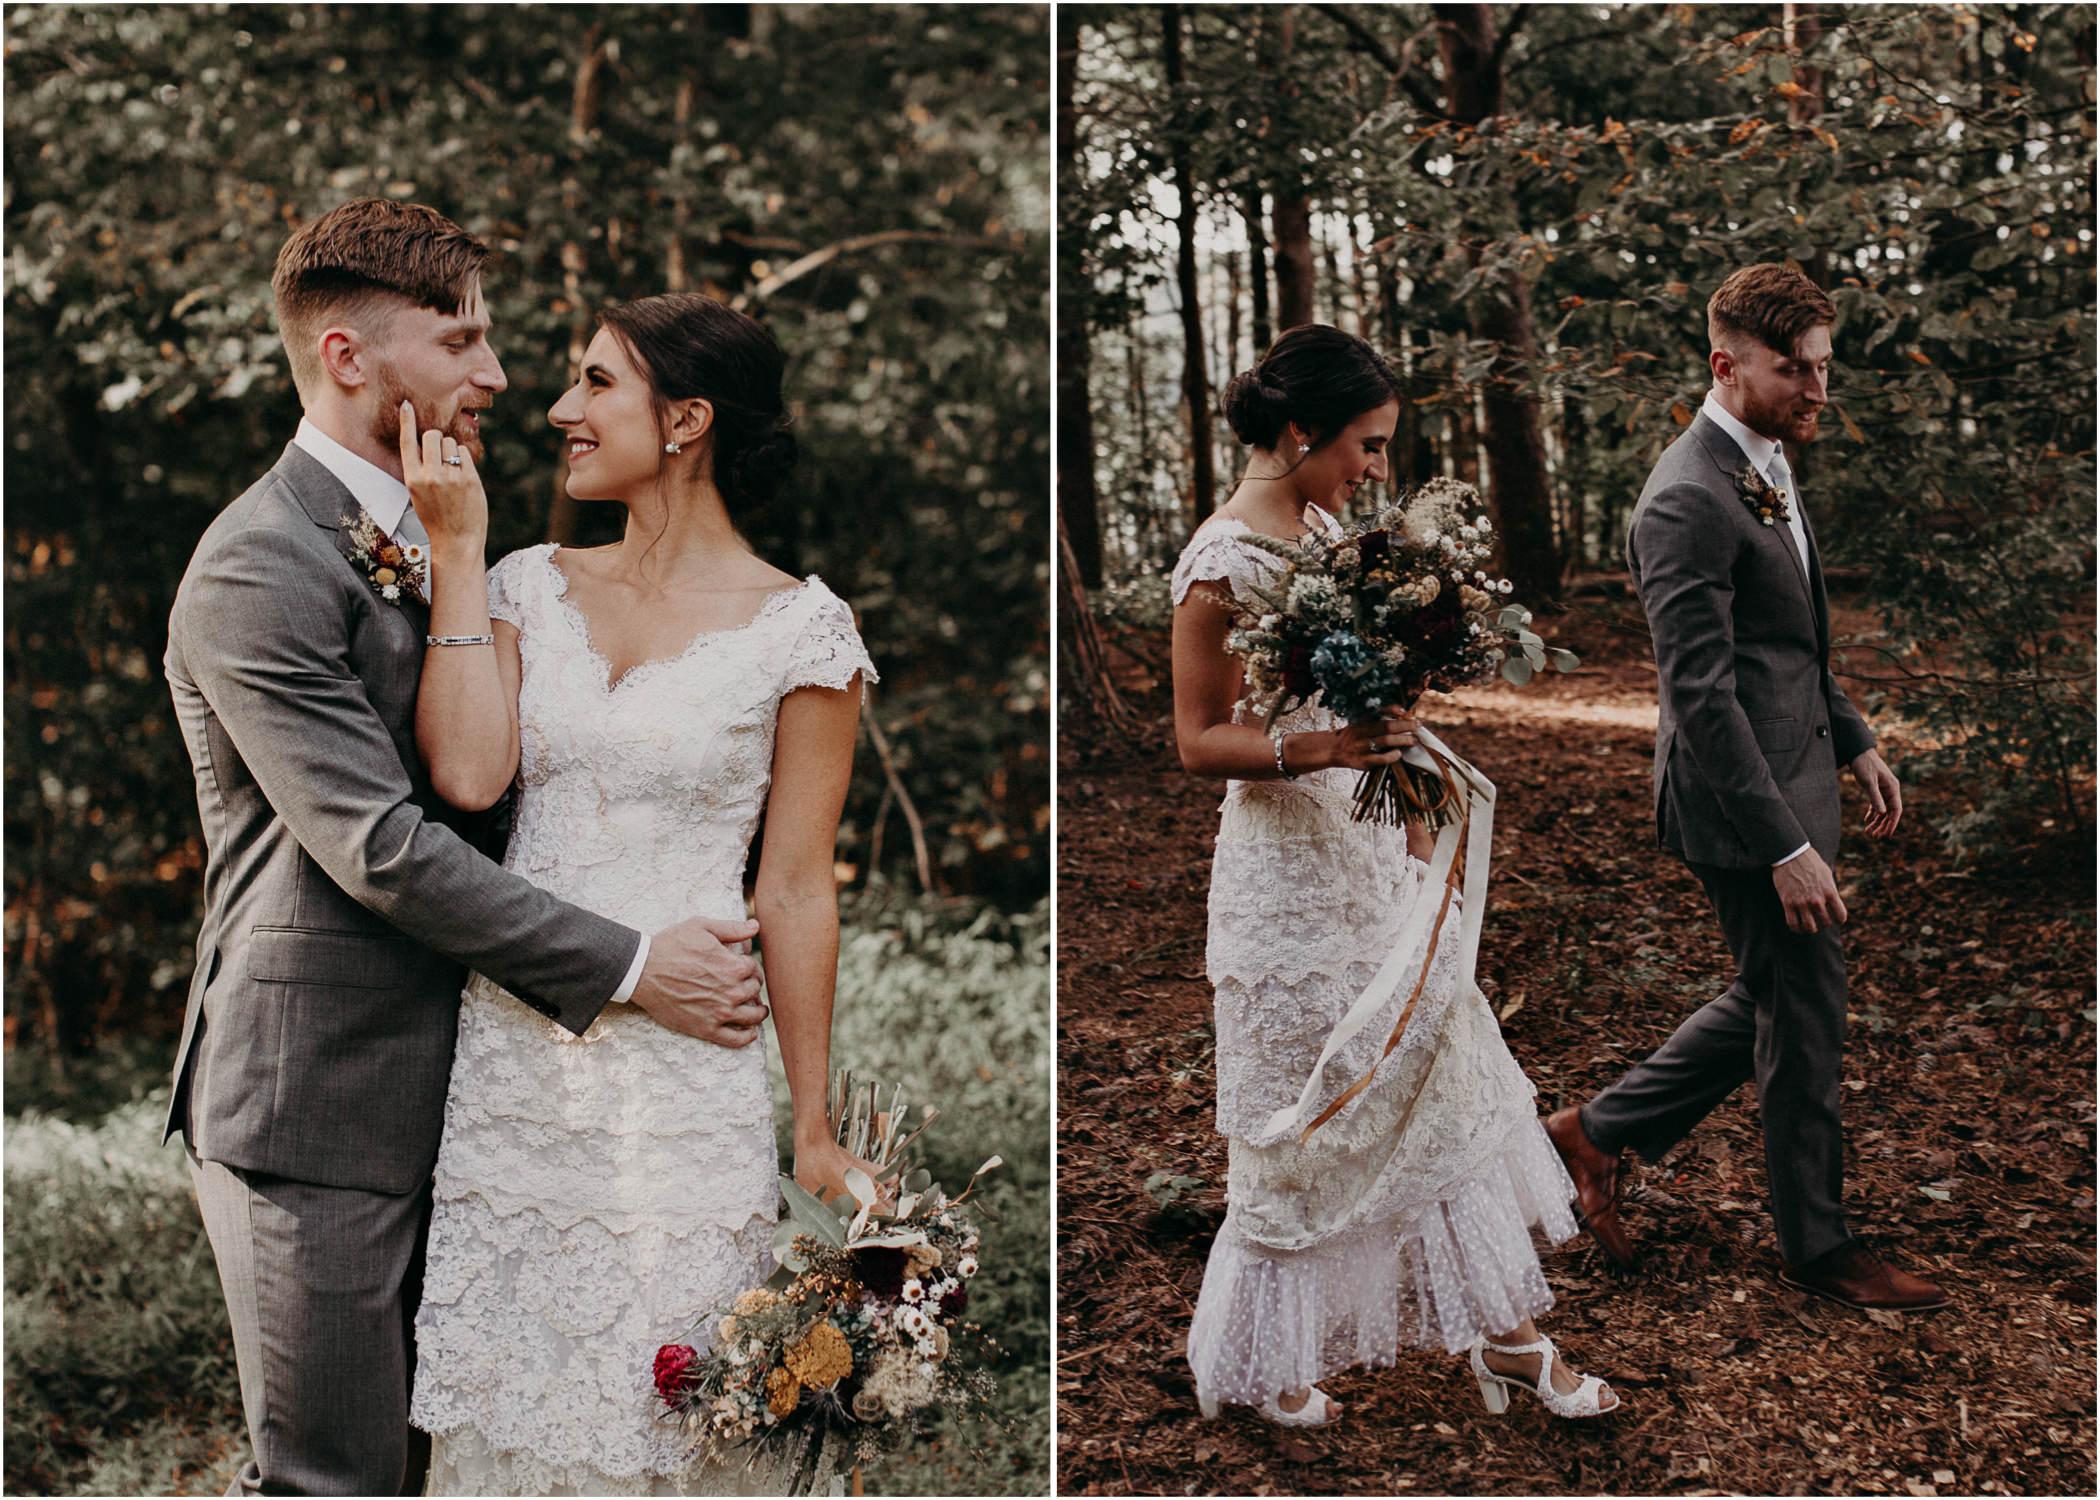 49 Bride & Groom first look before the ceremony on wedding day - Atlanta Wedding Photographer .jpg